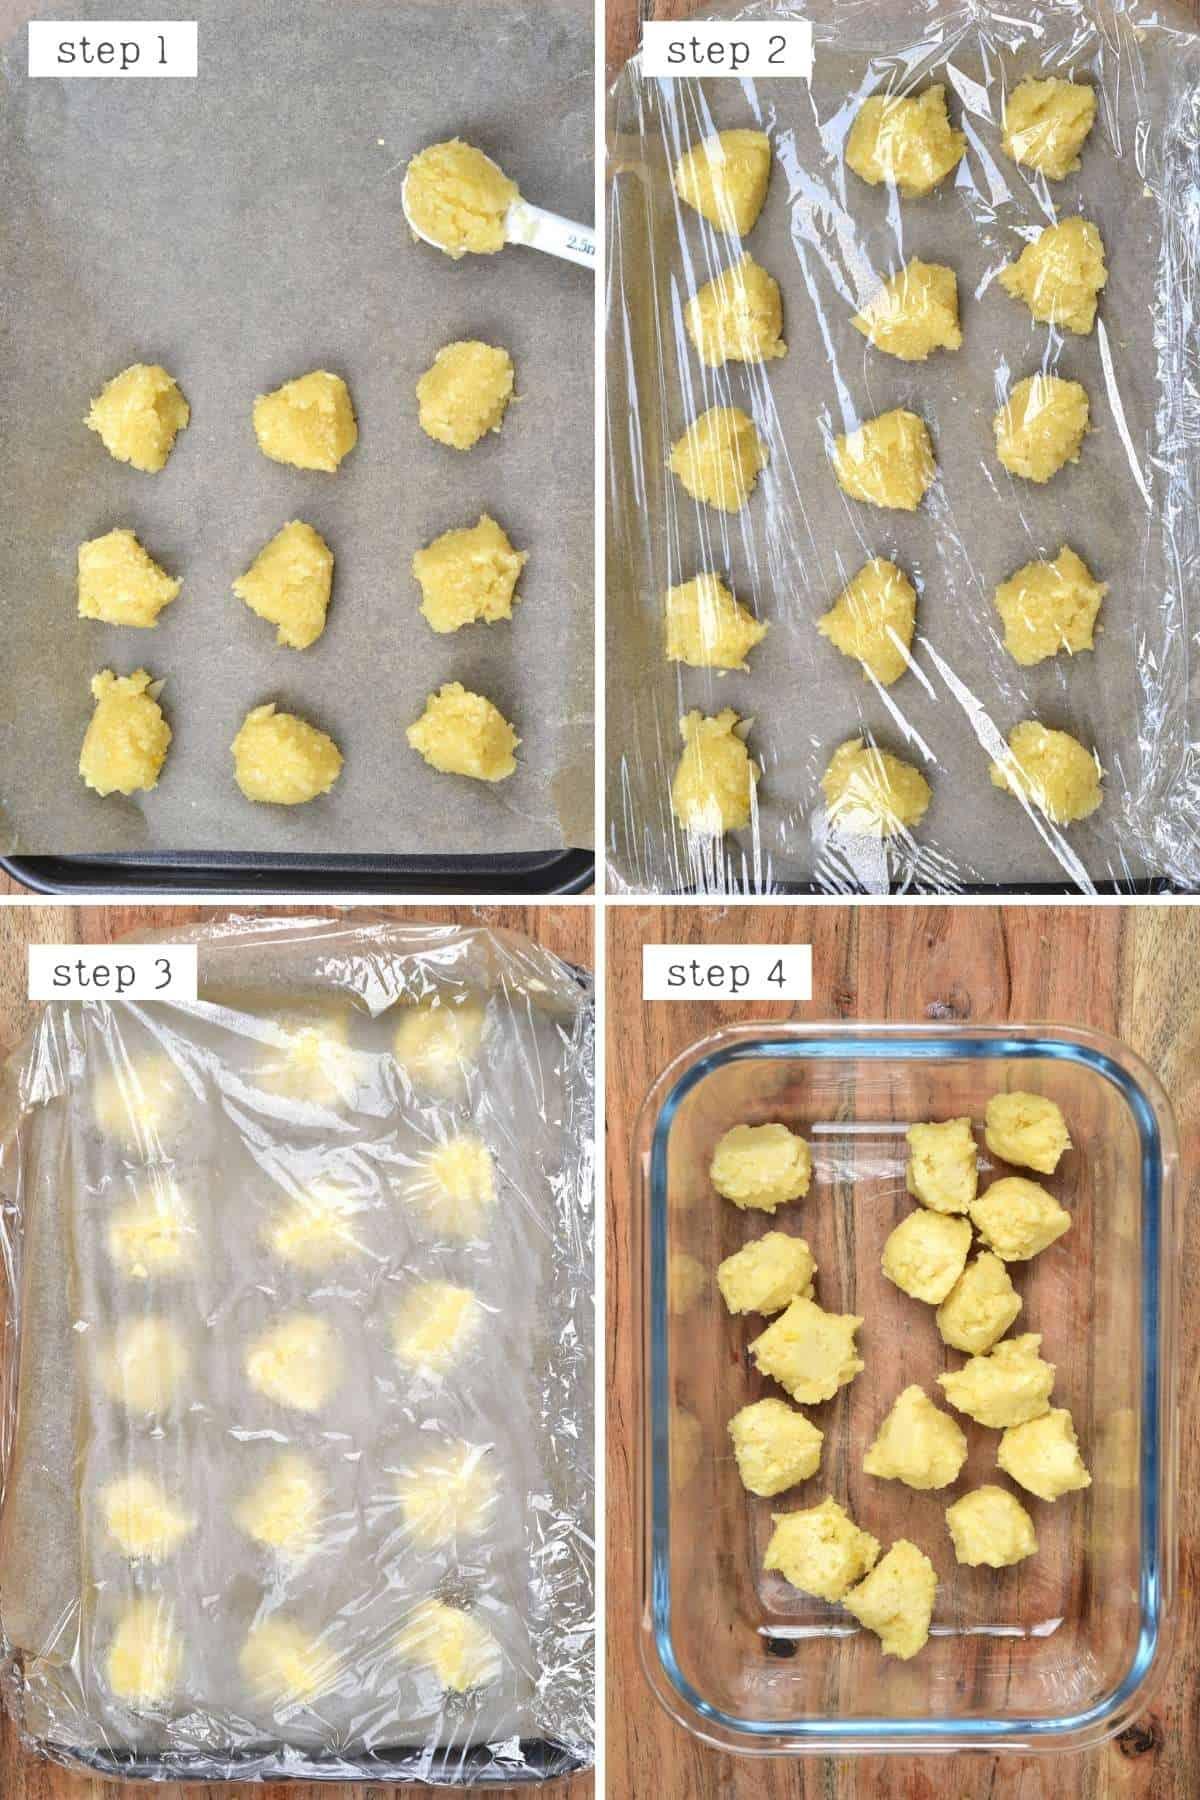 Steps for freezing pureed garlic